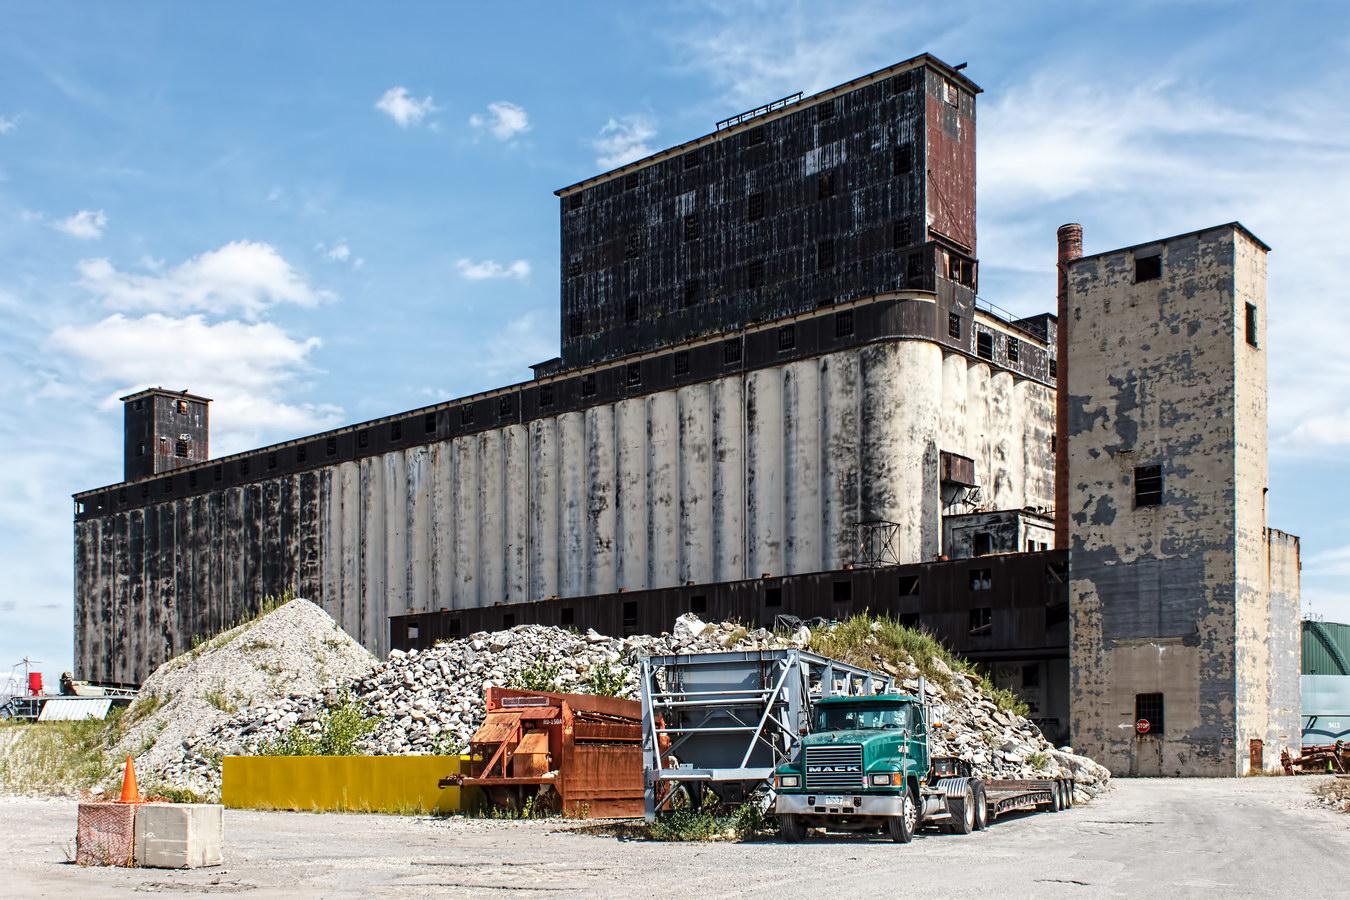 Port of New York Authority Grain Terminal